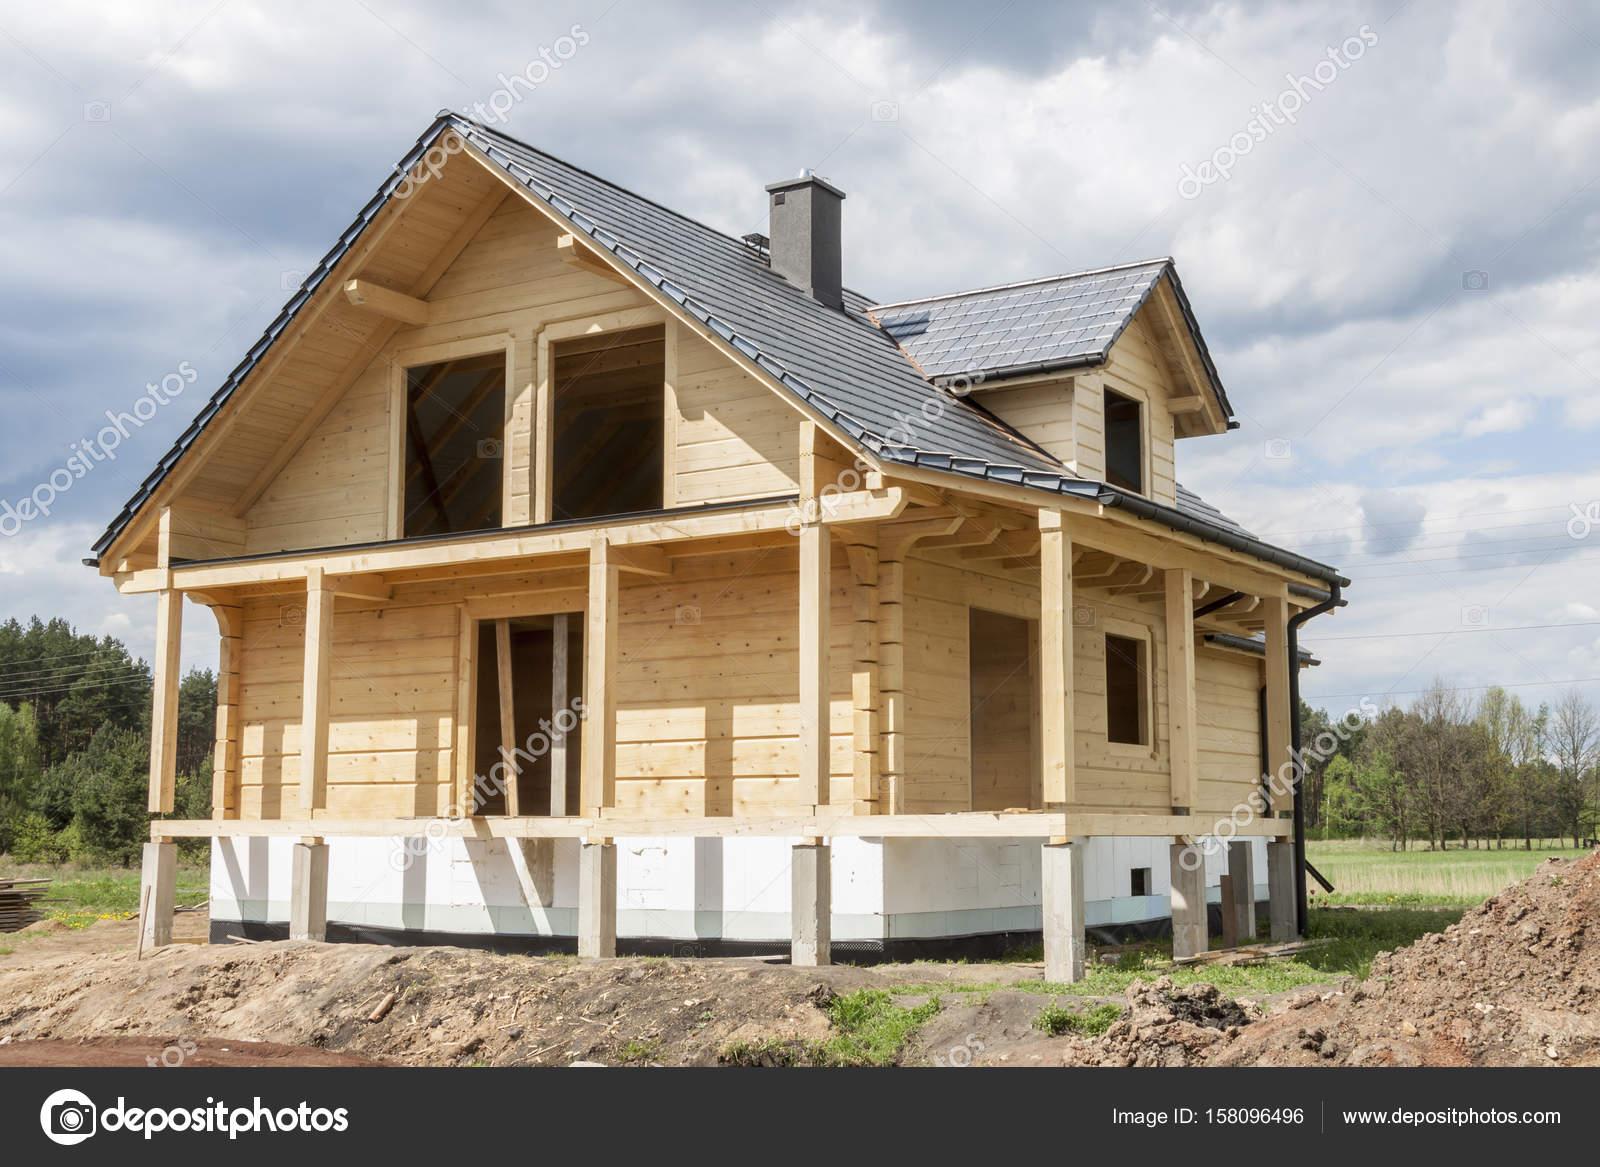 Tetto in legno casa affiancata — Foto Stock © tomasz_parys #158096496